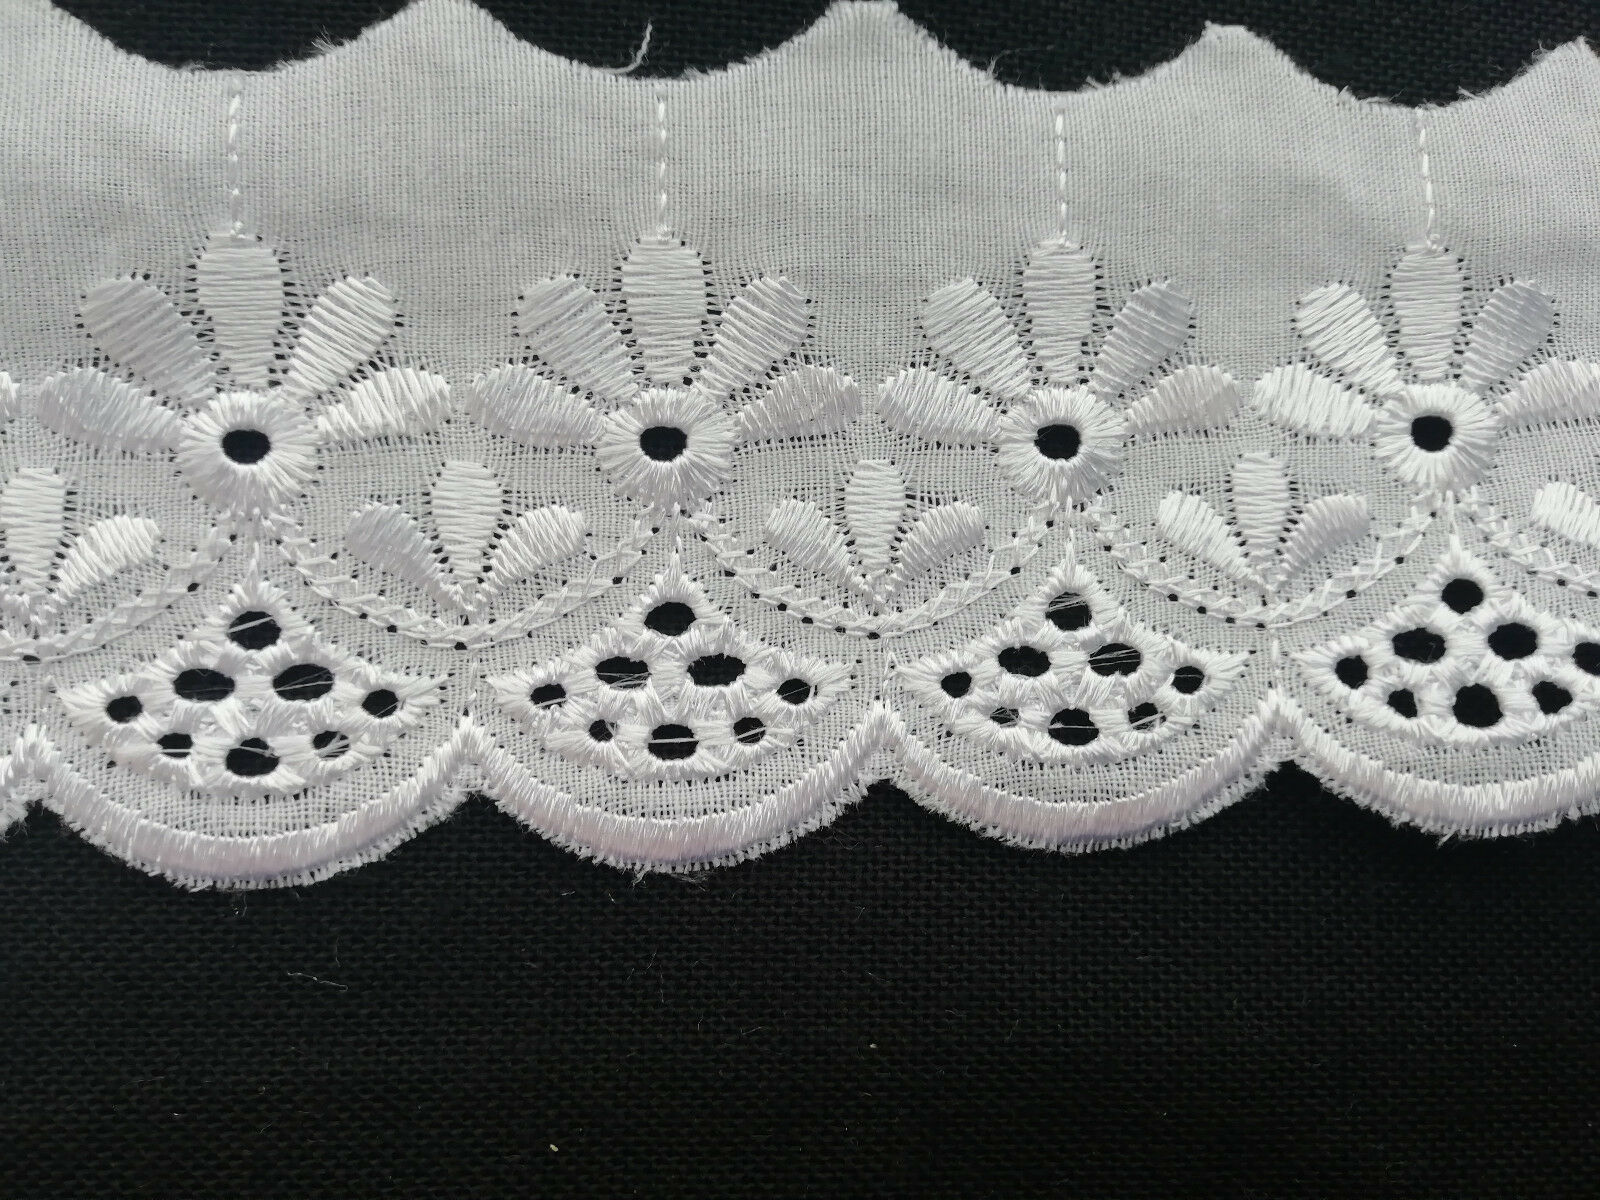 Spitzenborte weiß  4cm Bordüre Saum Spitze Tischdecke Gardine Kissen Bett deko